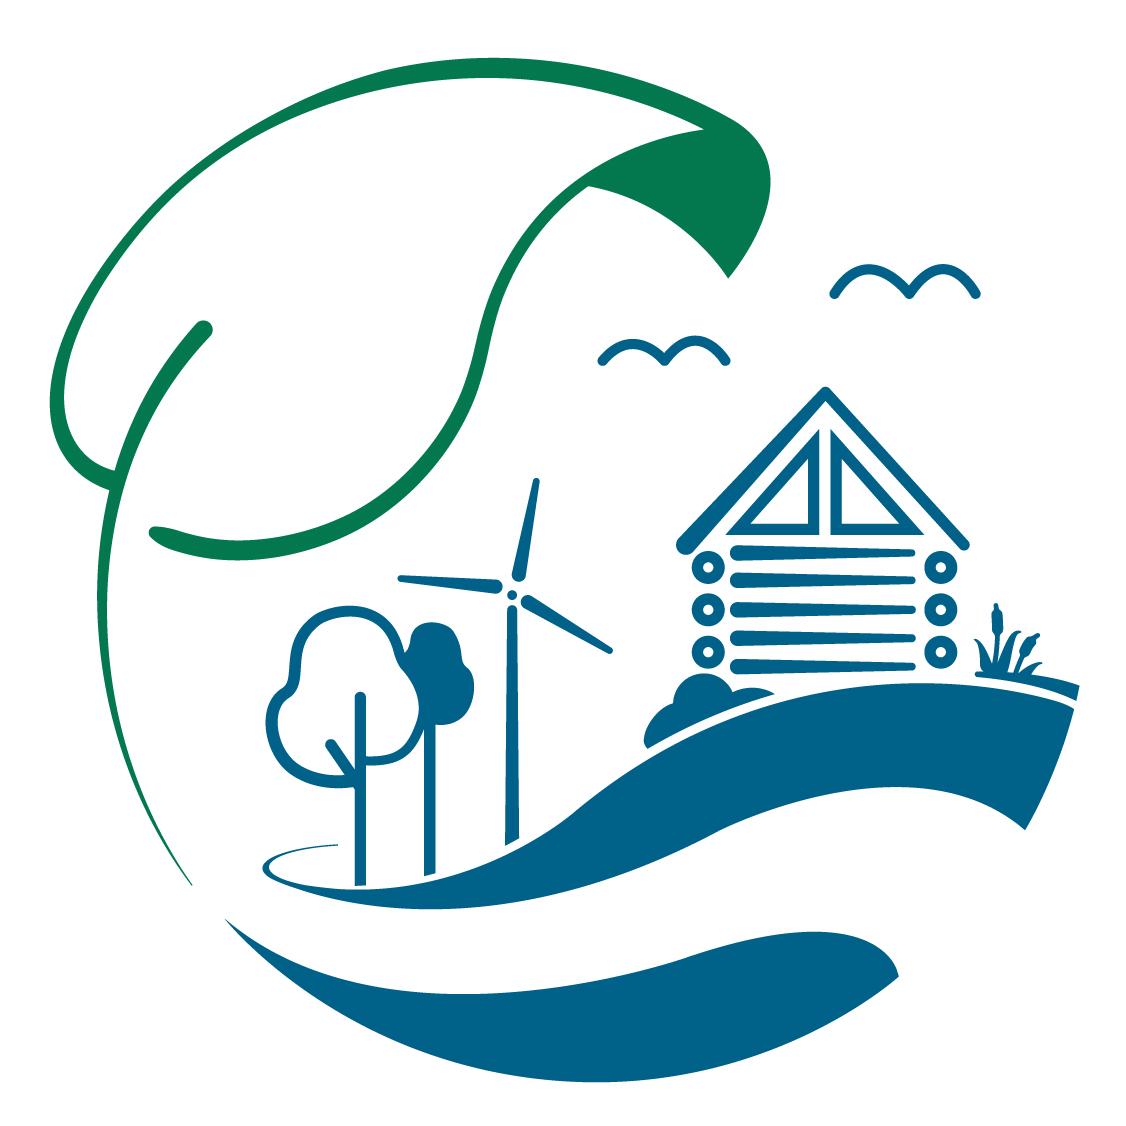 Environmental center clip clipart clip art black and white download Elkhart Environmental Center / Elkhart, IN clip art black and white download